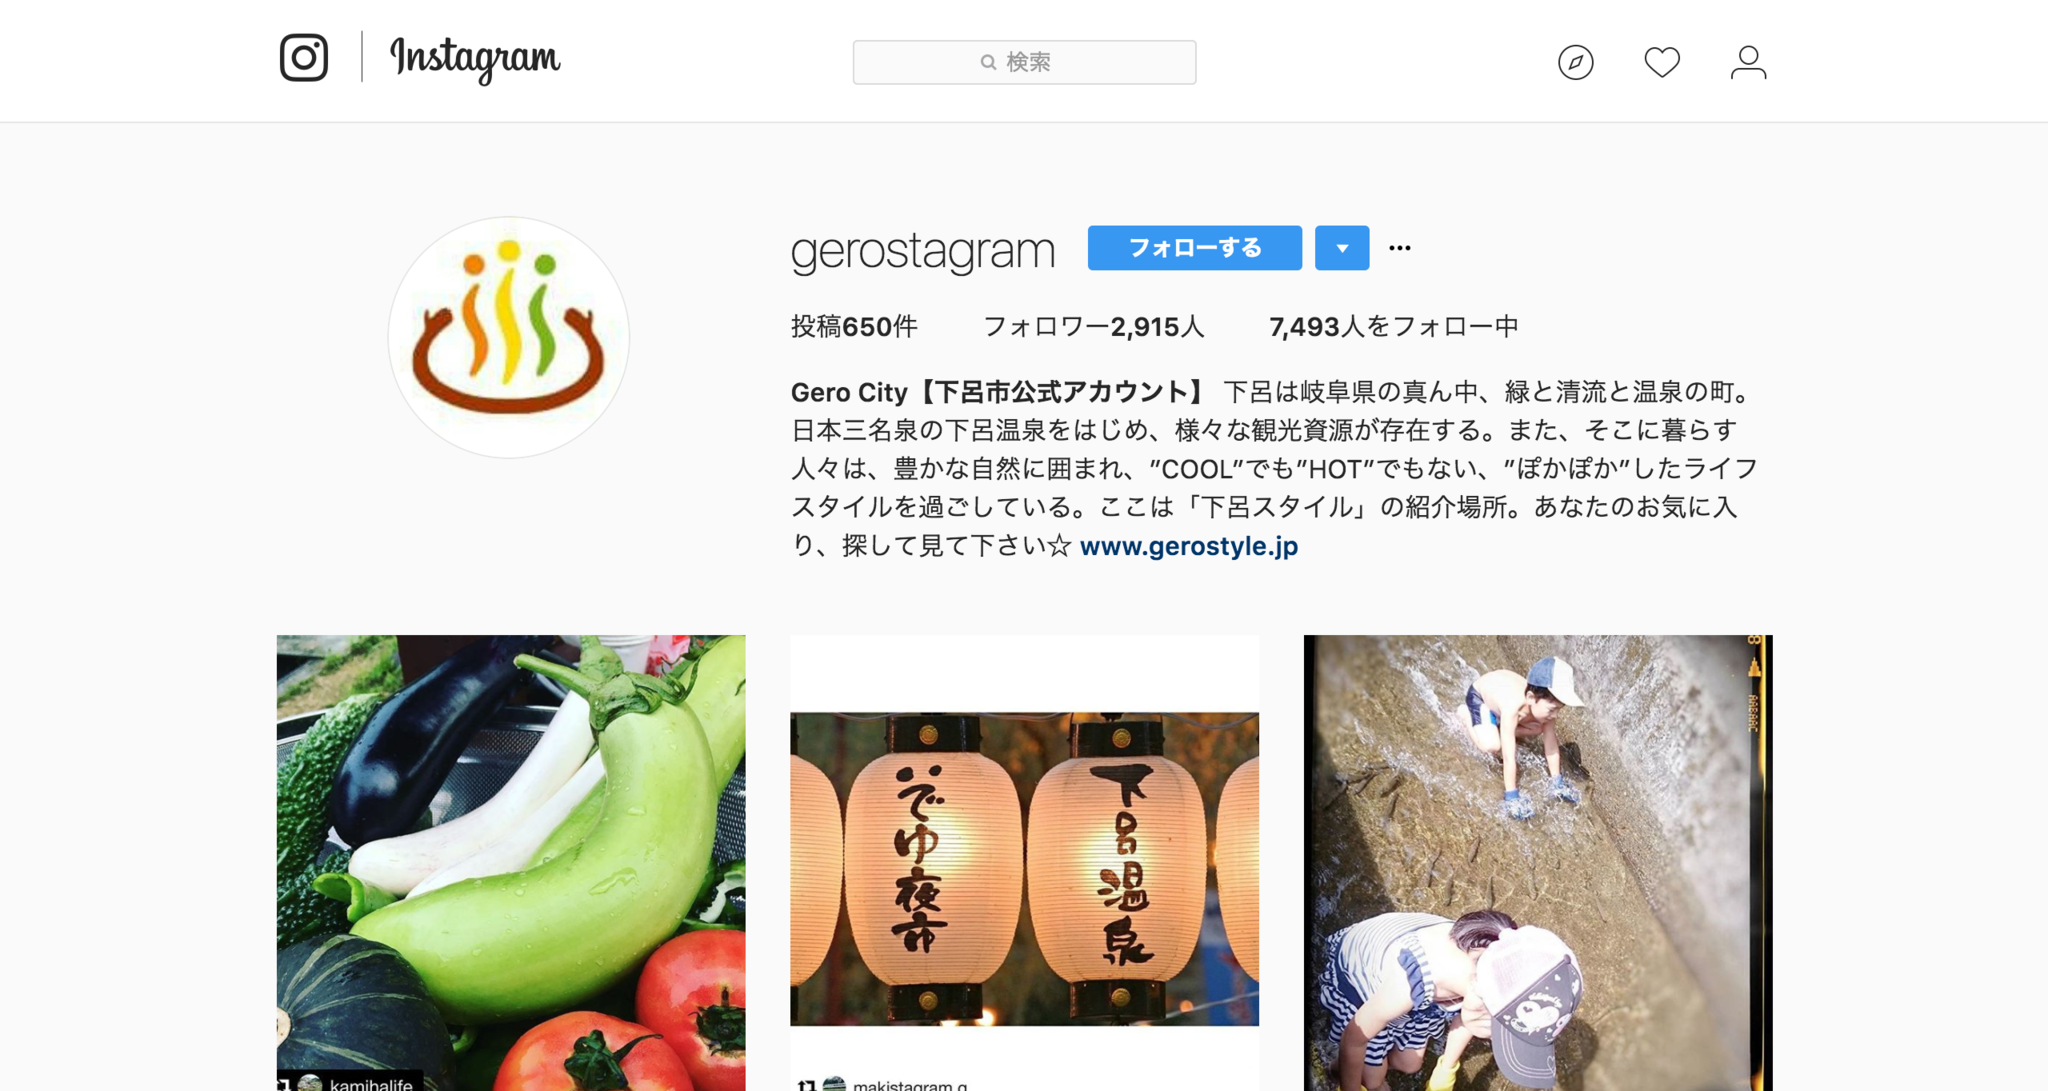 Gero_City【下呂市公式アカウント】さん__gerostagram__•_Instagram写真と動画.png